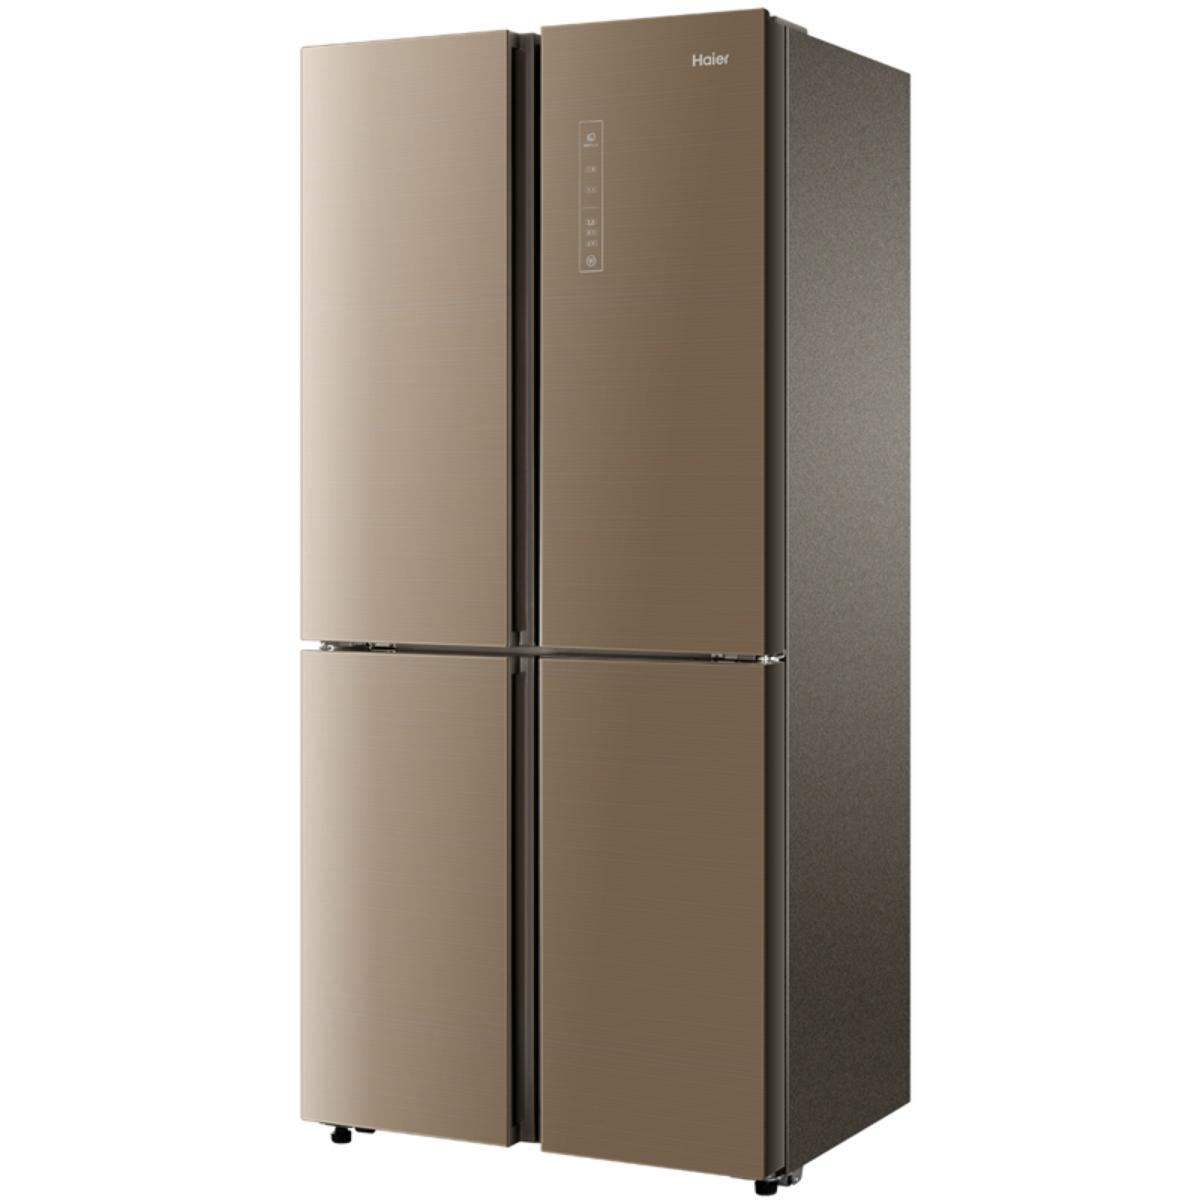 Haier/海尔                         冰箱                         海尔 冰箱 BCD-456WDGK